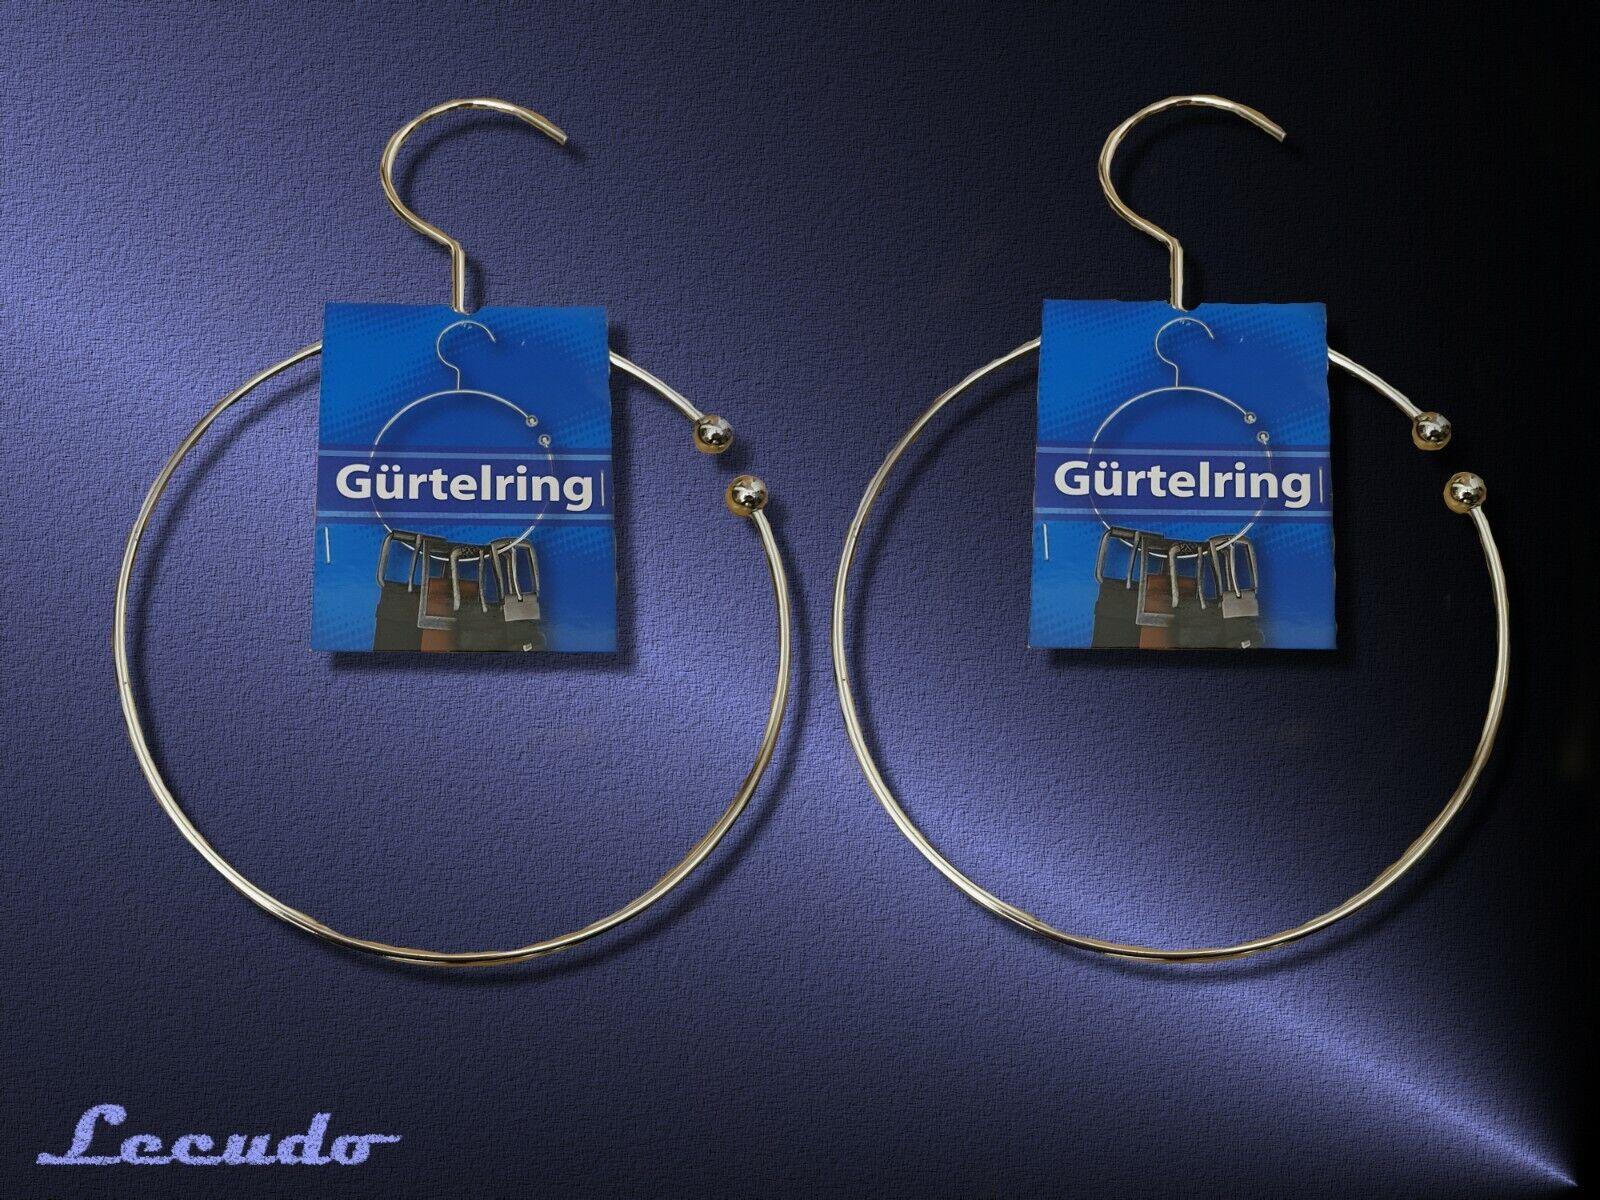 Gürtelring 2x Ring Bügel Kleiderhaken für Gürtel Krawatten Tücher Schal 15cm